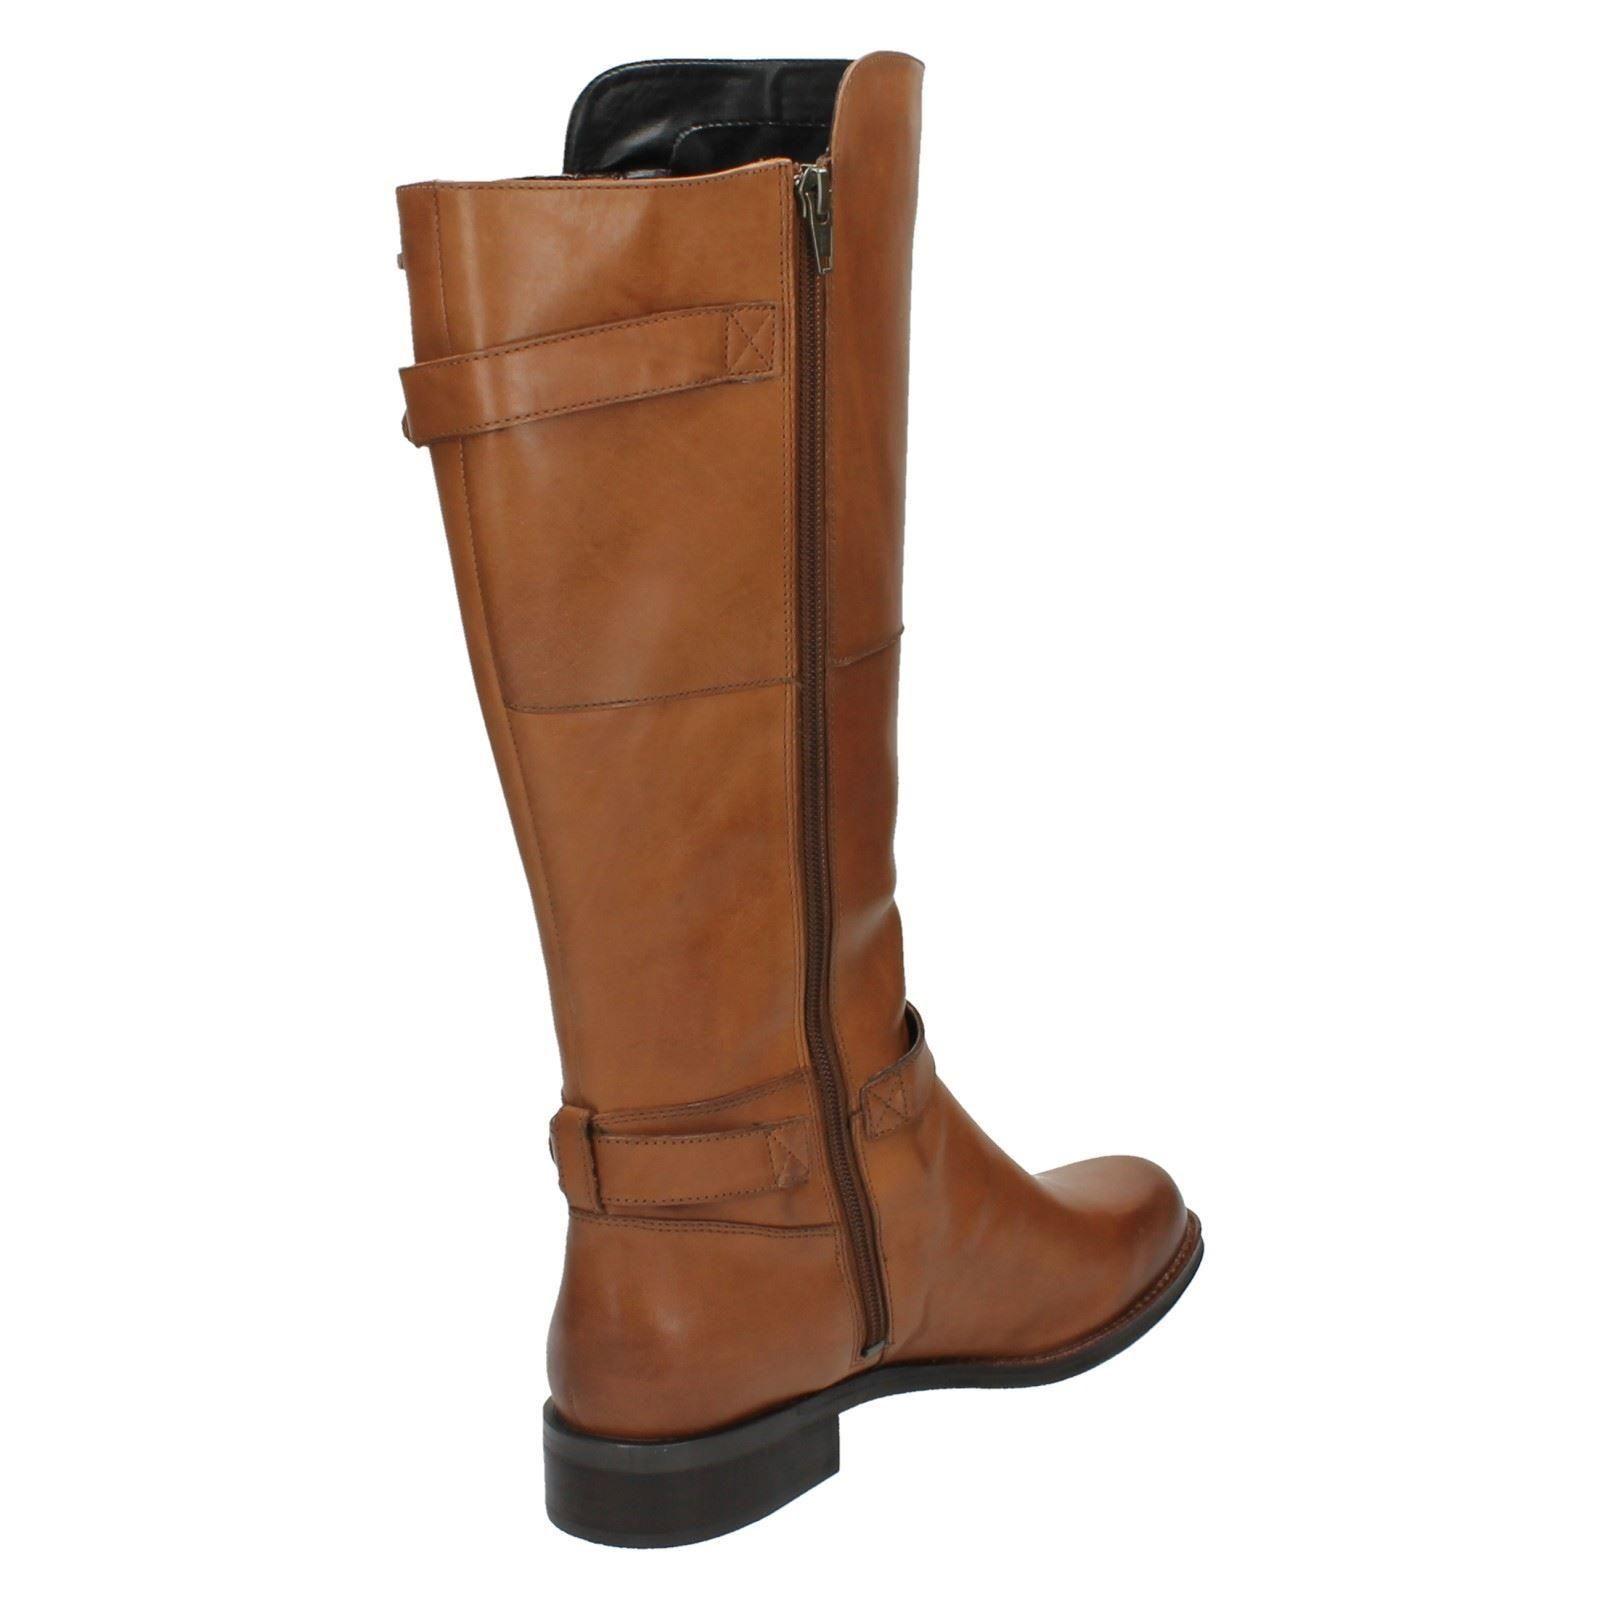 clarks goretex leather boots mara vale gtx ebay